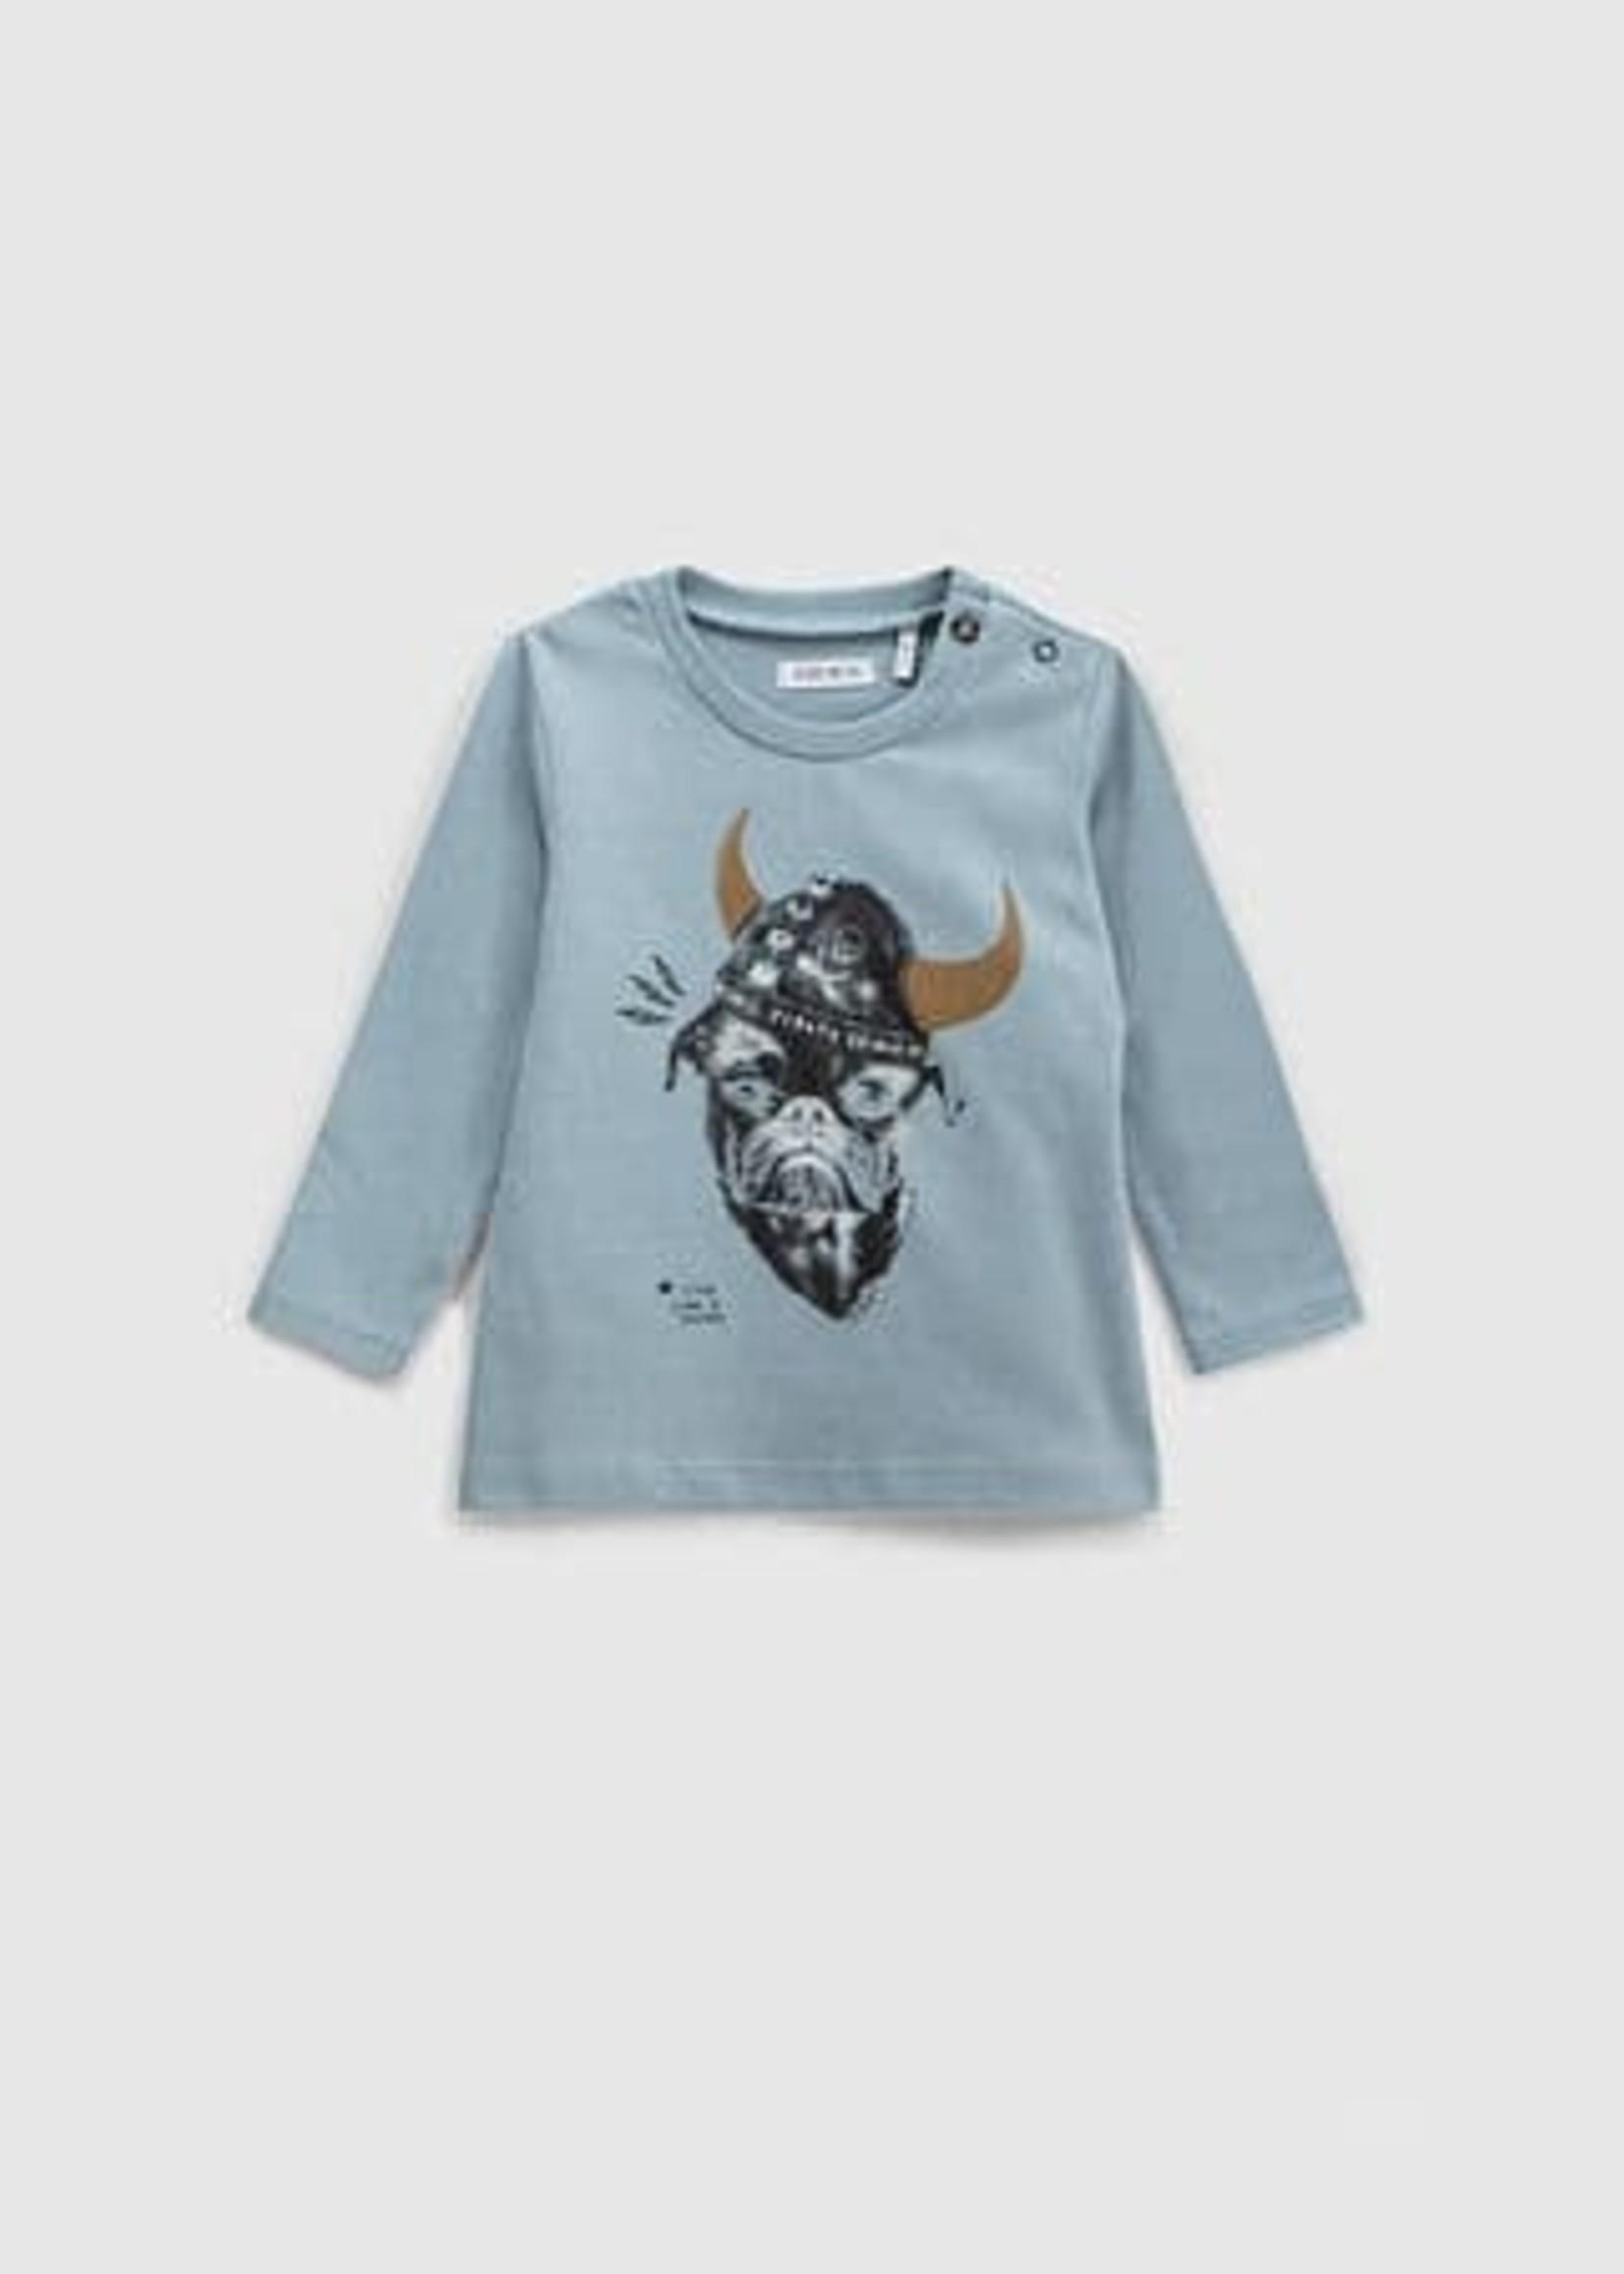 IKKS IKKS viking rocker tshirt